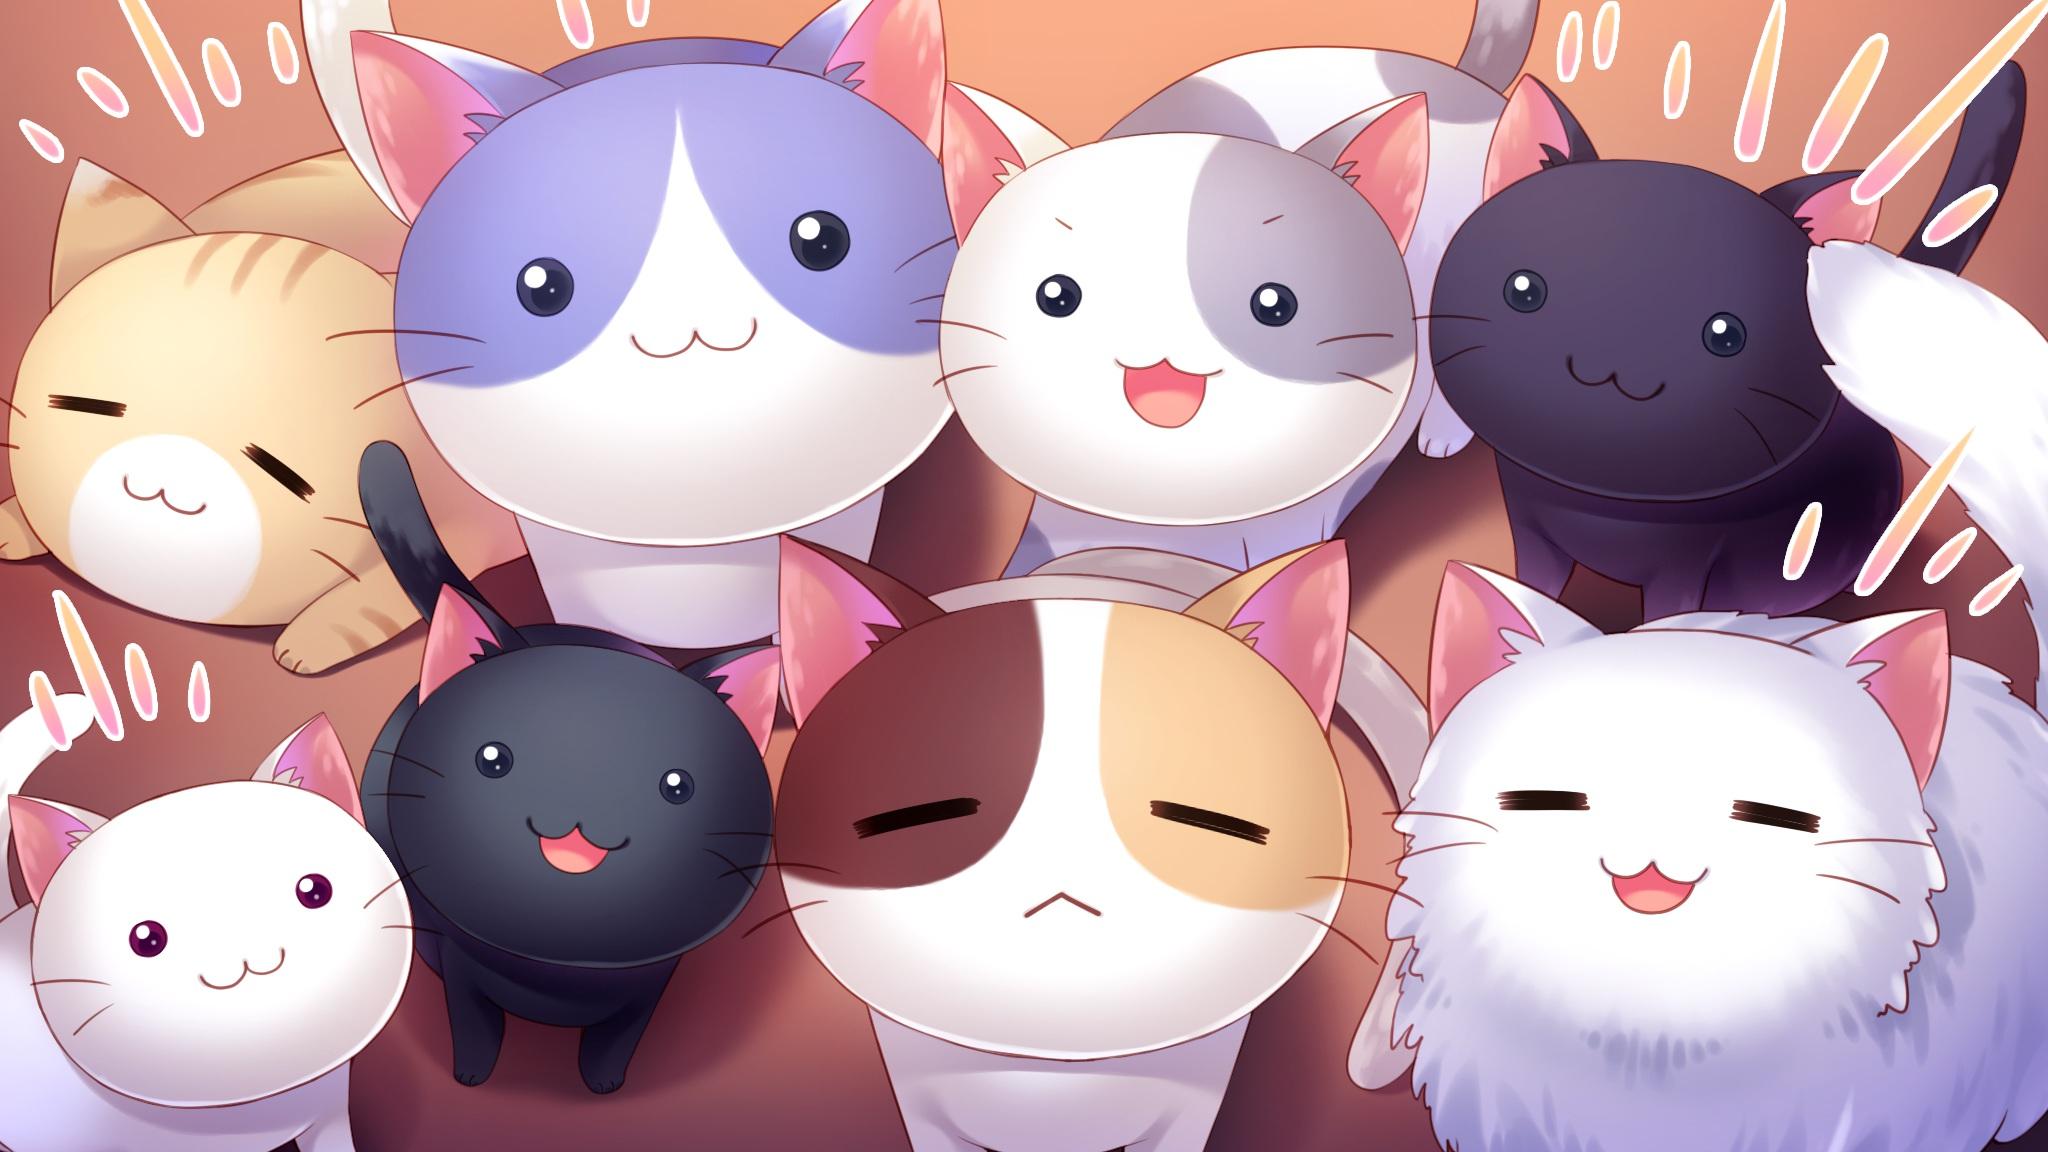 Nyan Cafe Macchiato Animal Cat Cat Smile Game Cg Nyan Cafe